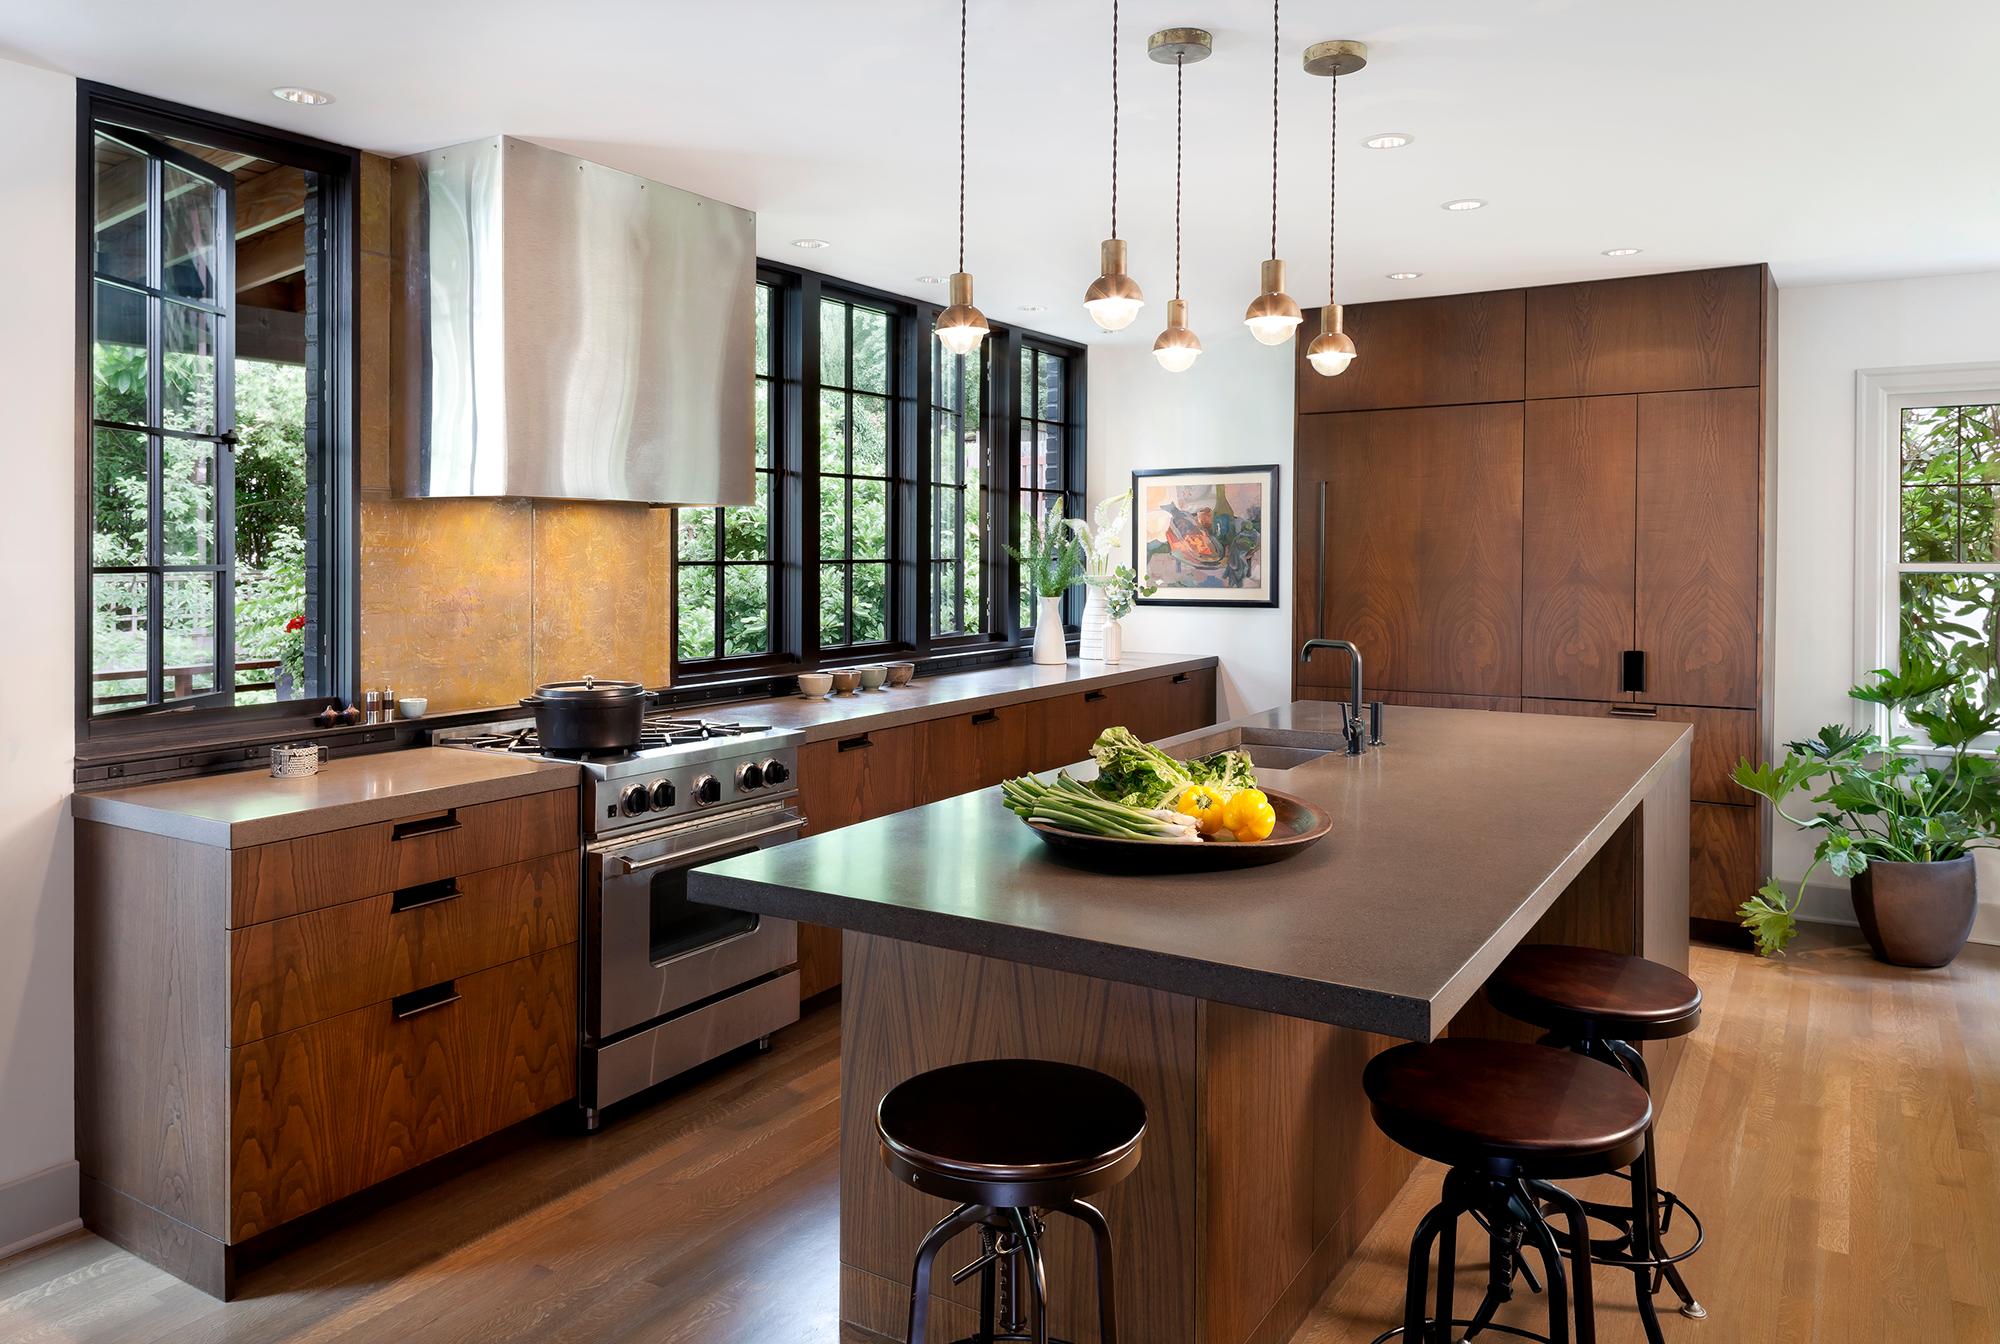 rerucha-studio-architecture-interior-design-seattle-brick-house-transformed-04-web.png